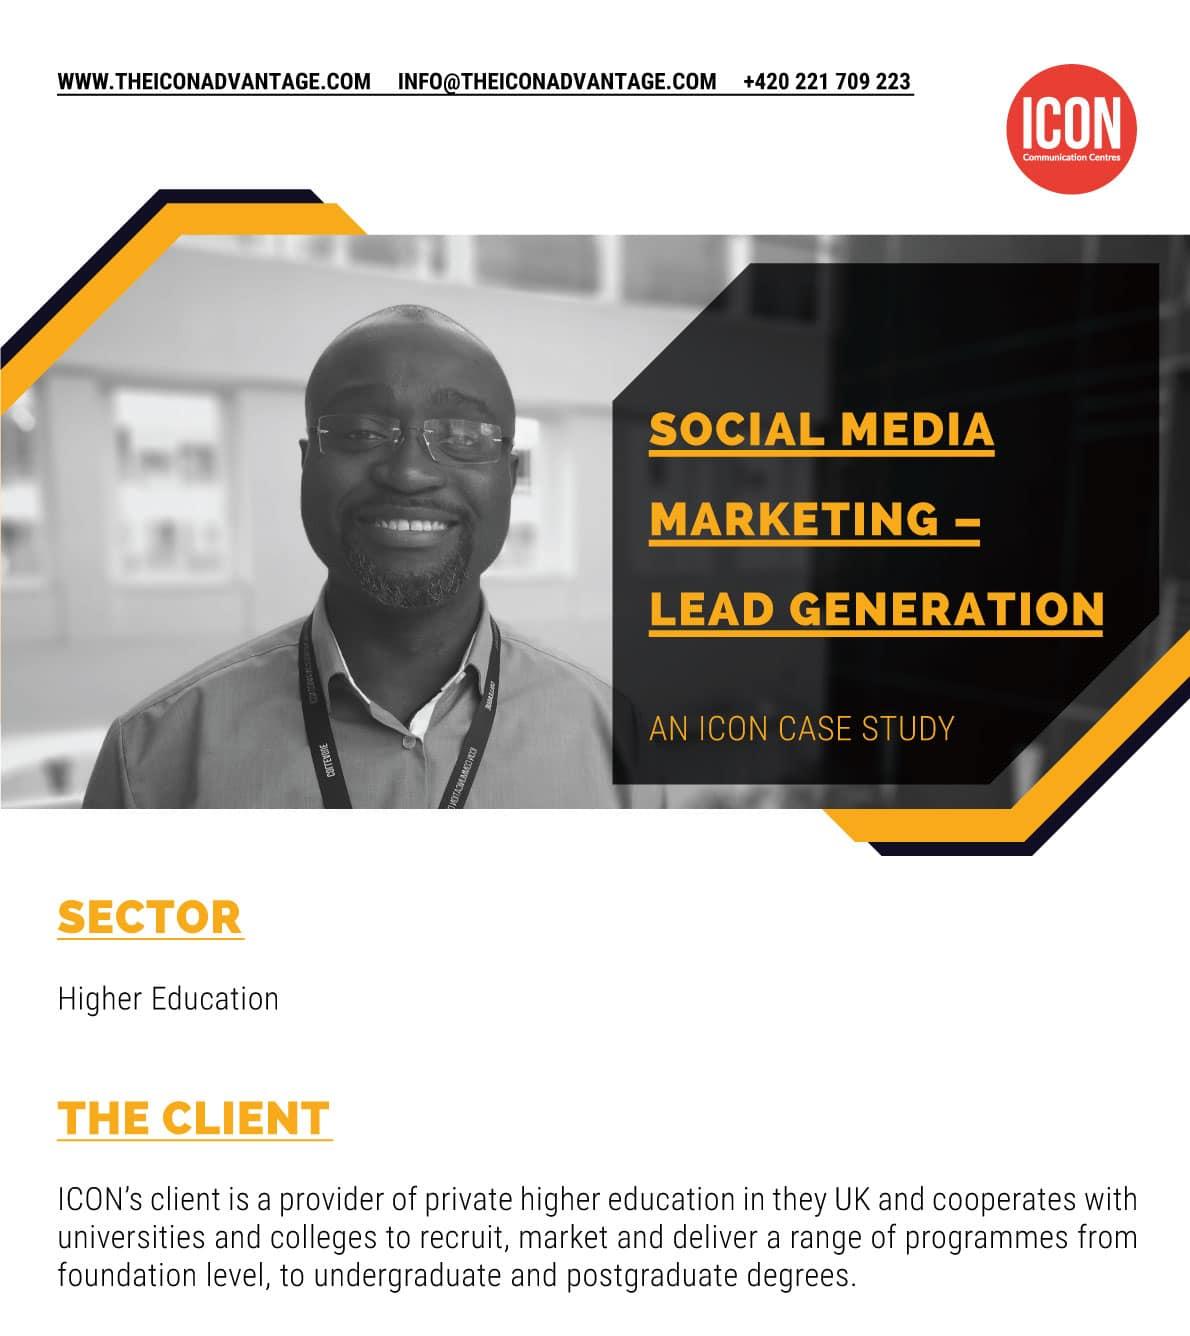 icon_case_study_lead_generation_1